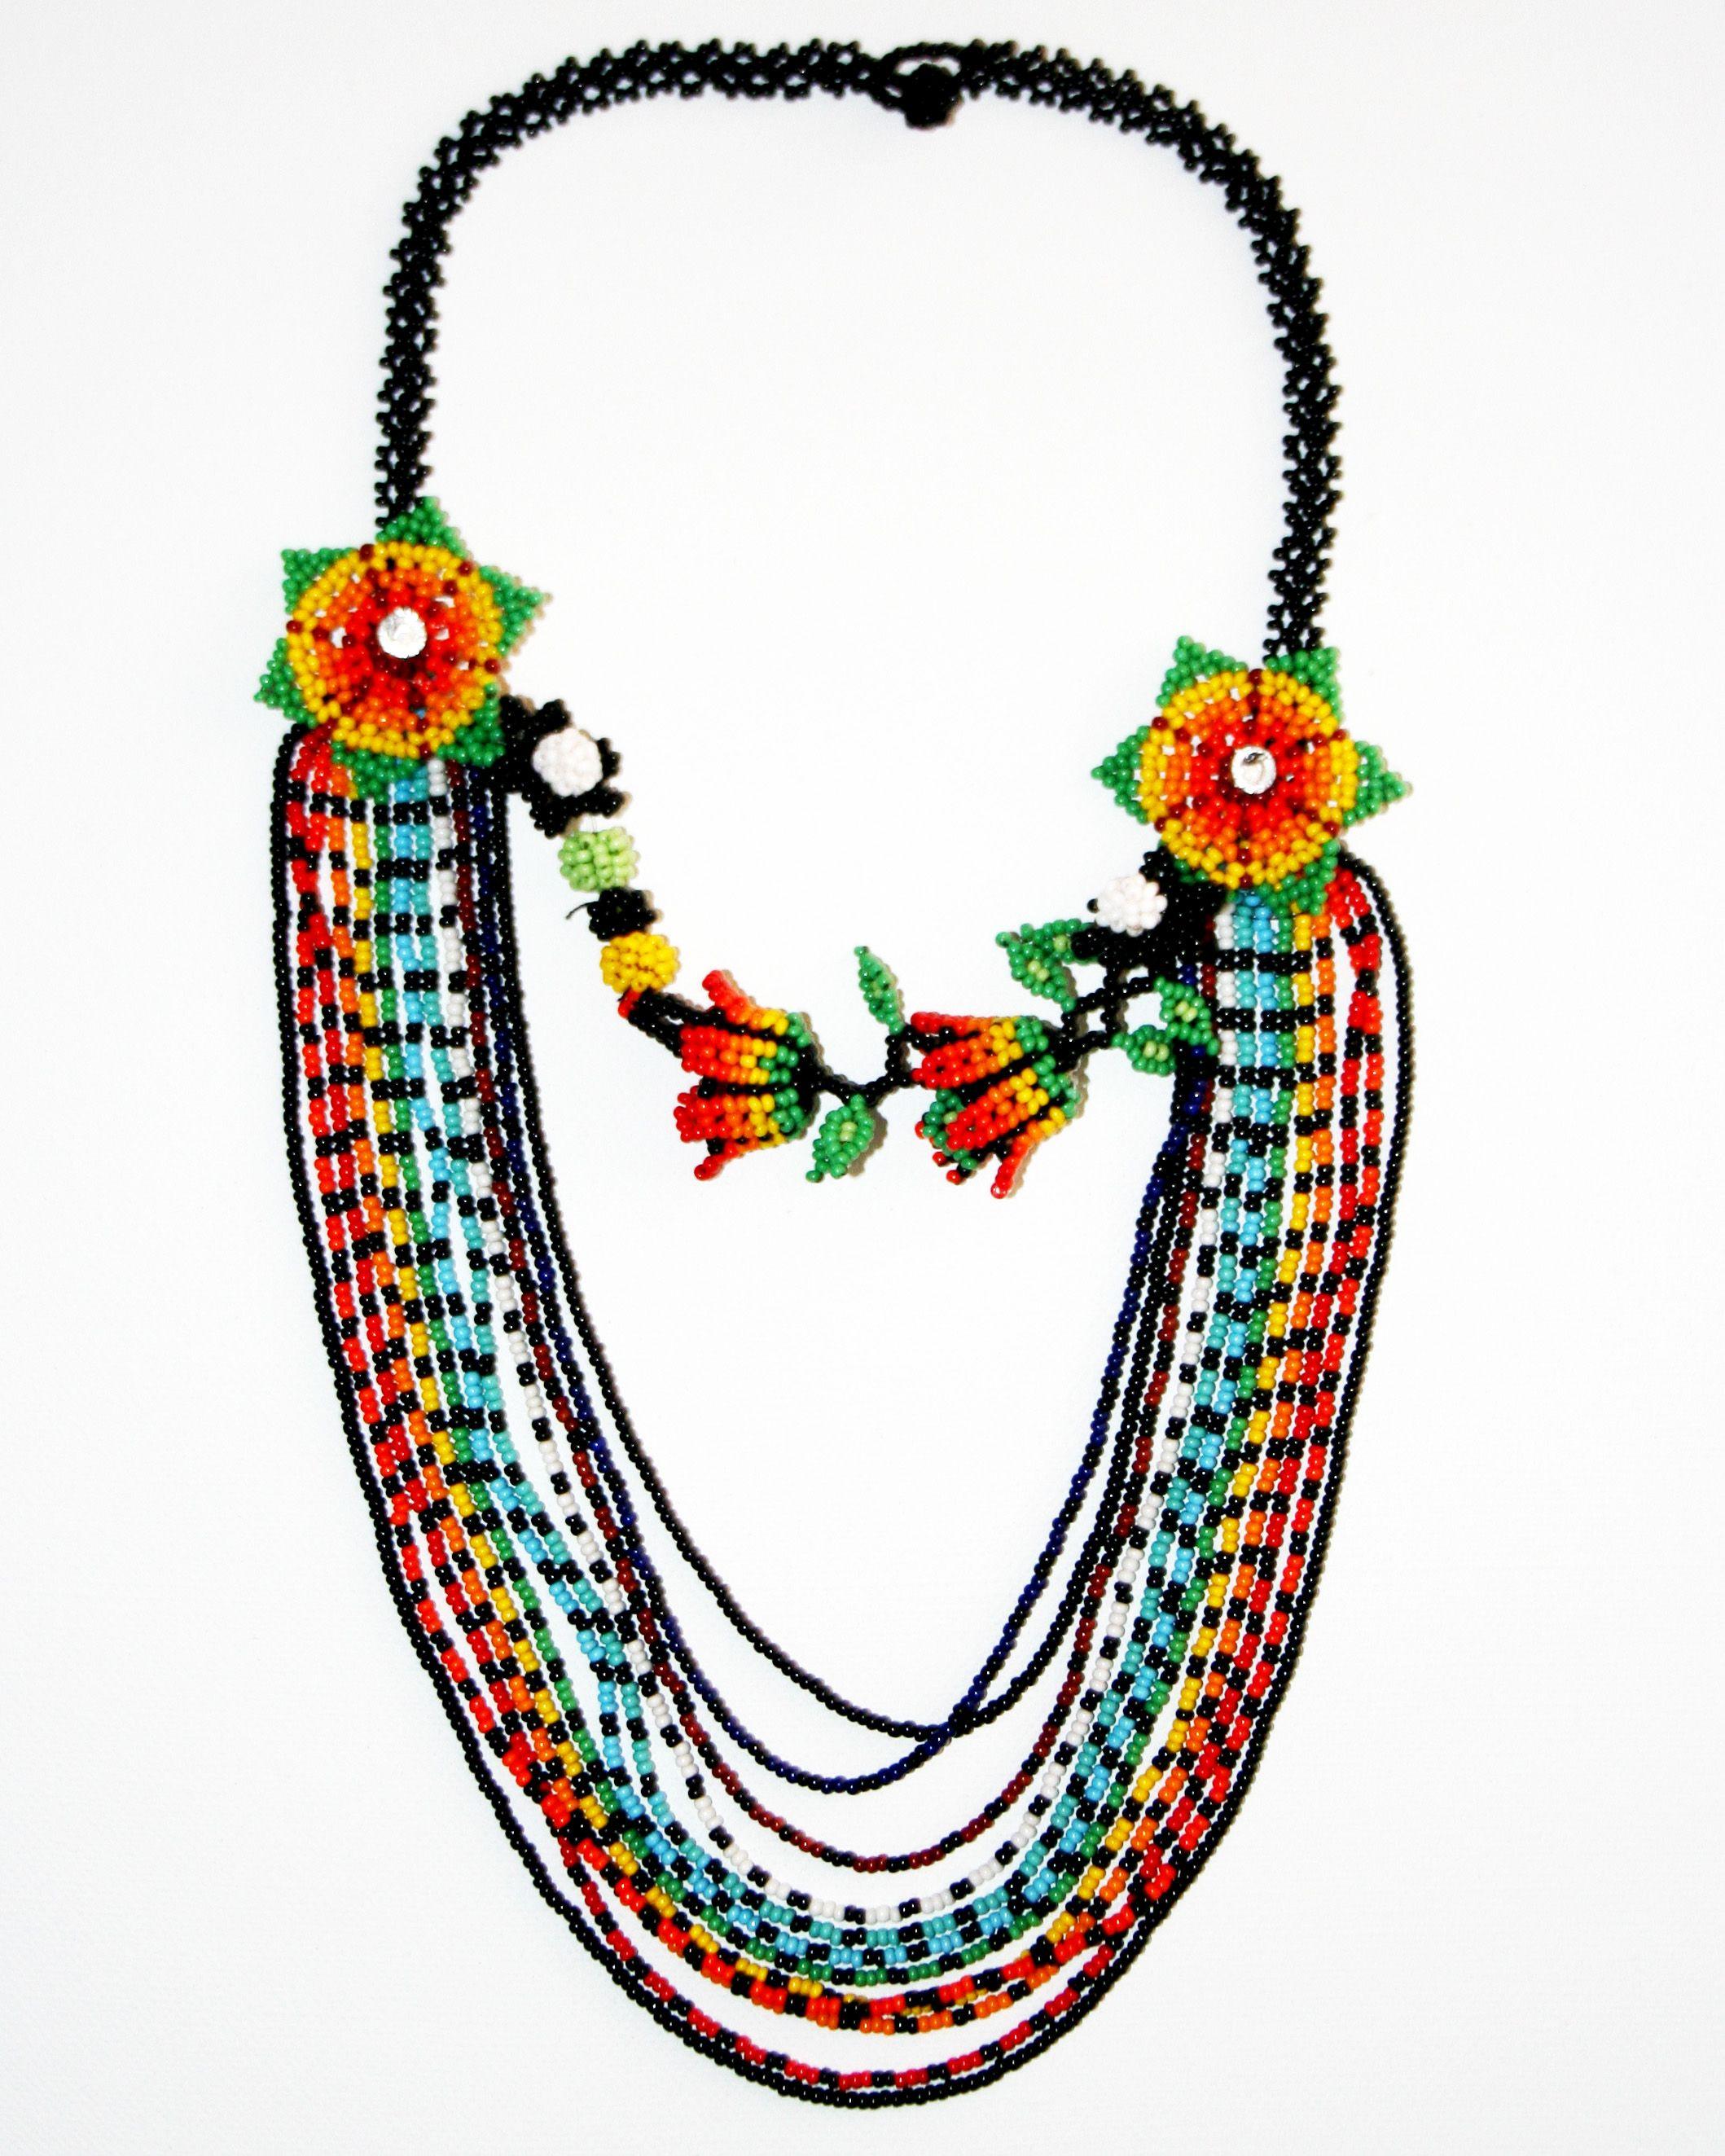 24be540dbd6a Realizado en canutillos tejidos a mano  3  Collares  Necklace  Handmade   Amazonas